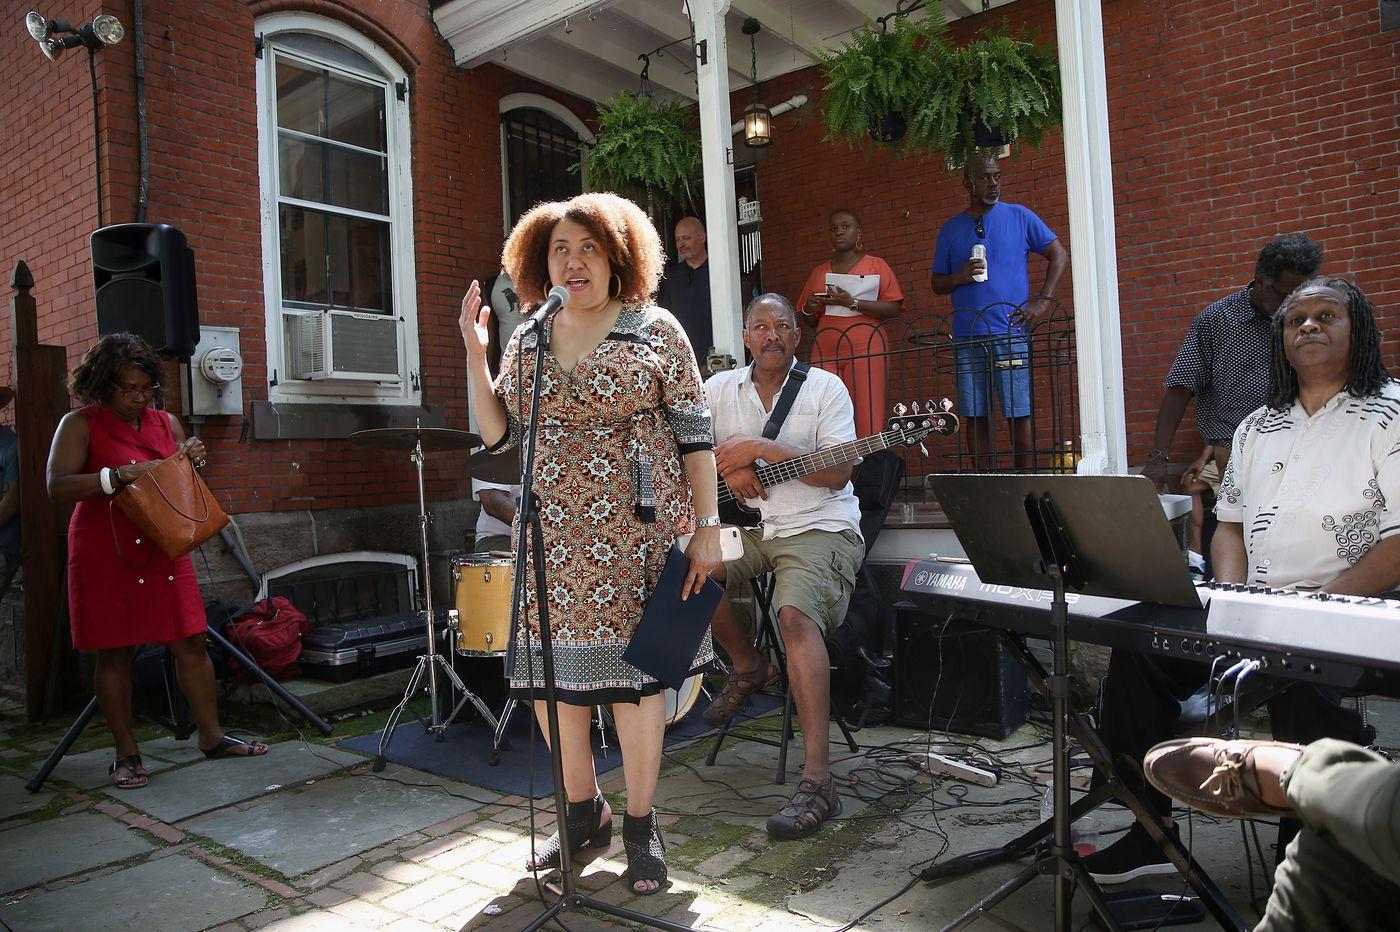 Akwaaba chooses theme for West Philadelphia bed-and-breakfast | Elizabeth Wellington